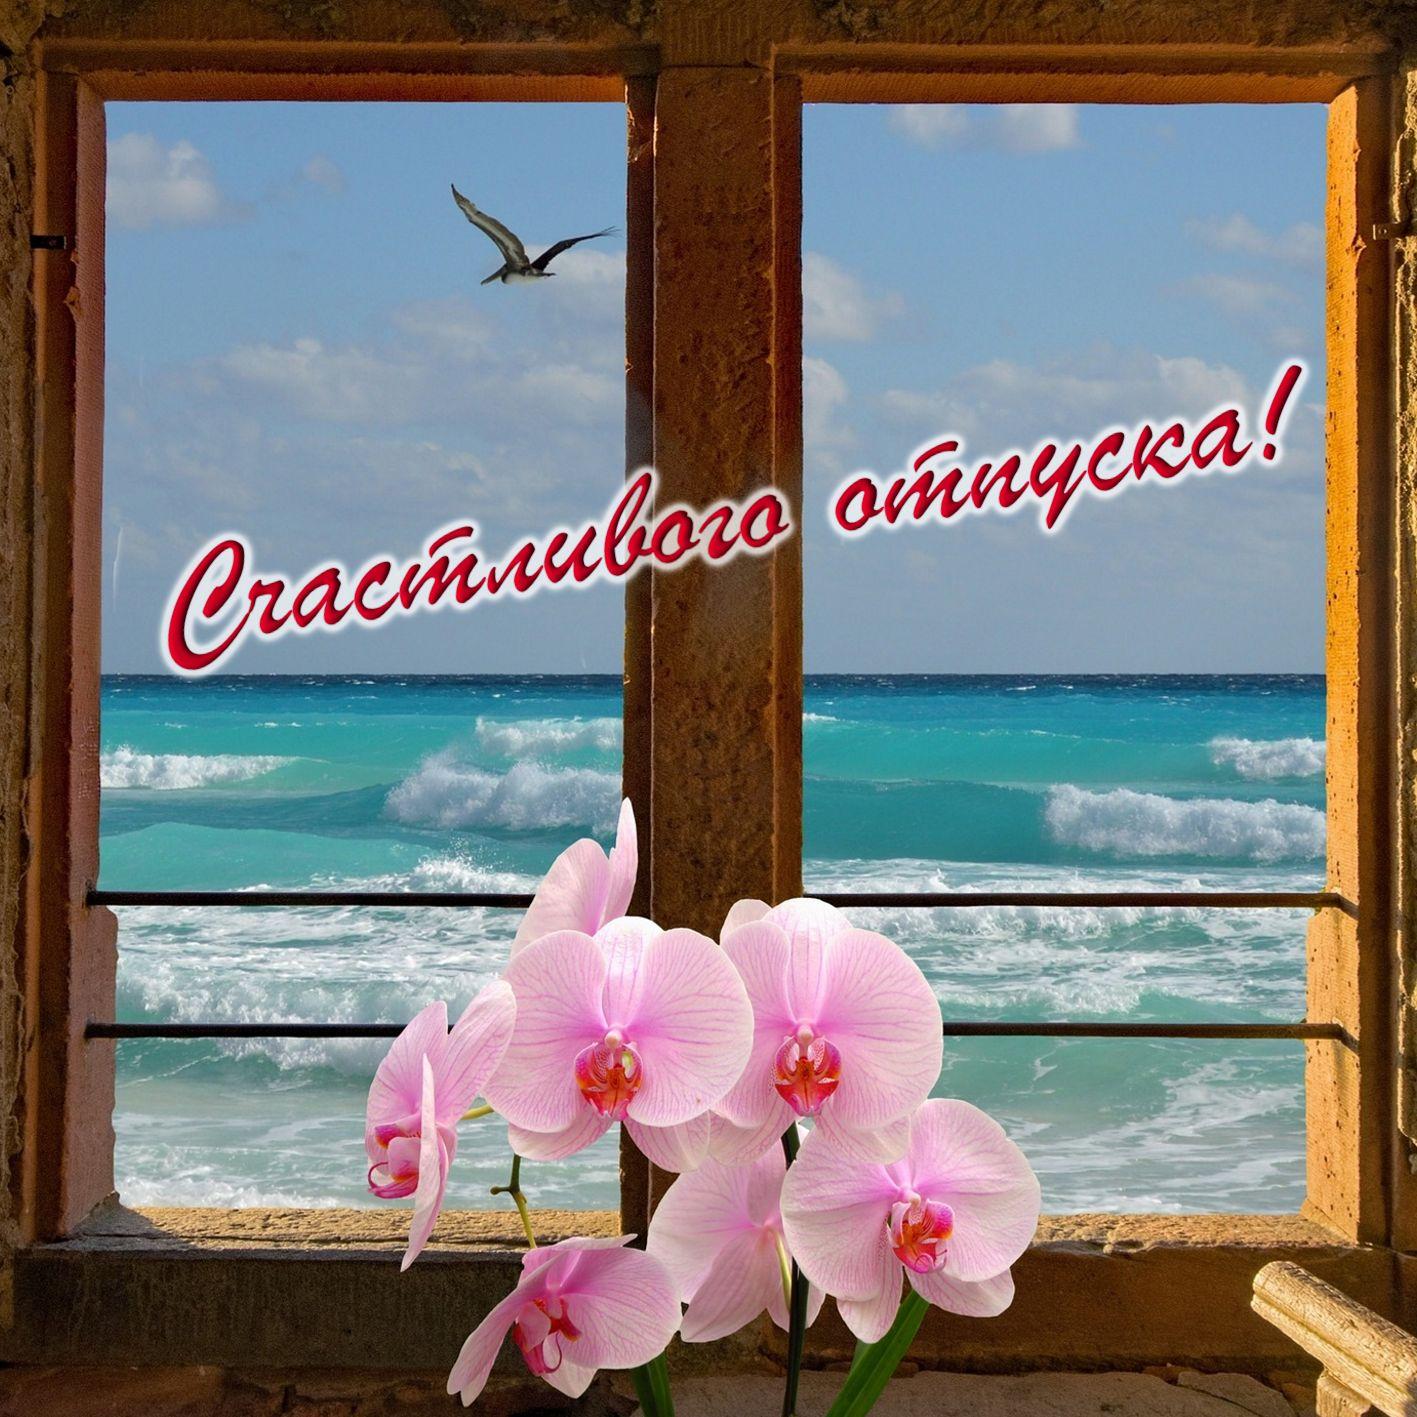 Открытка к отпуску - окошко с цветами с видом на море